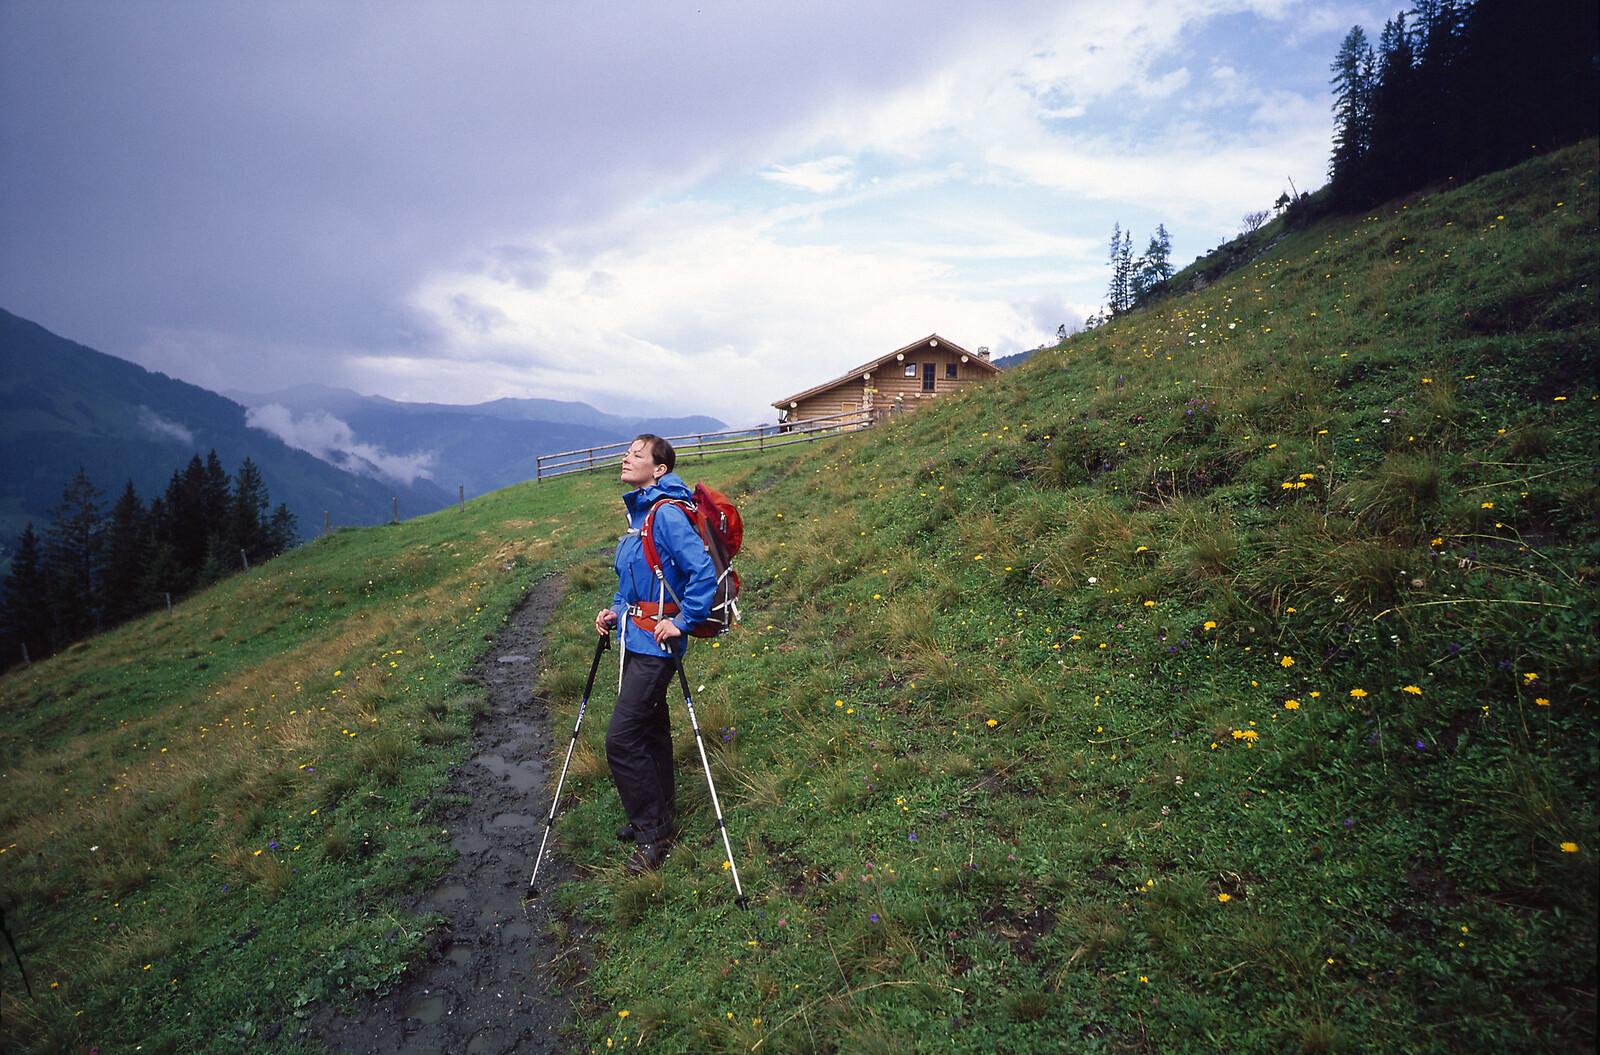 Woman walking up mountain track towards alpine hut in outdoor gear